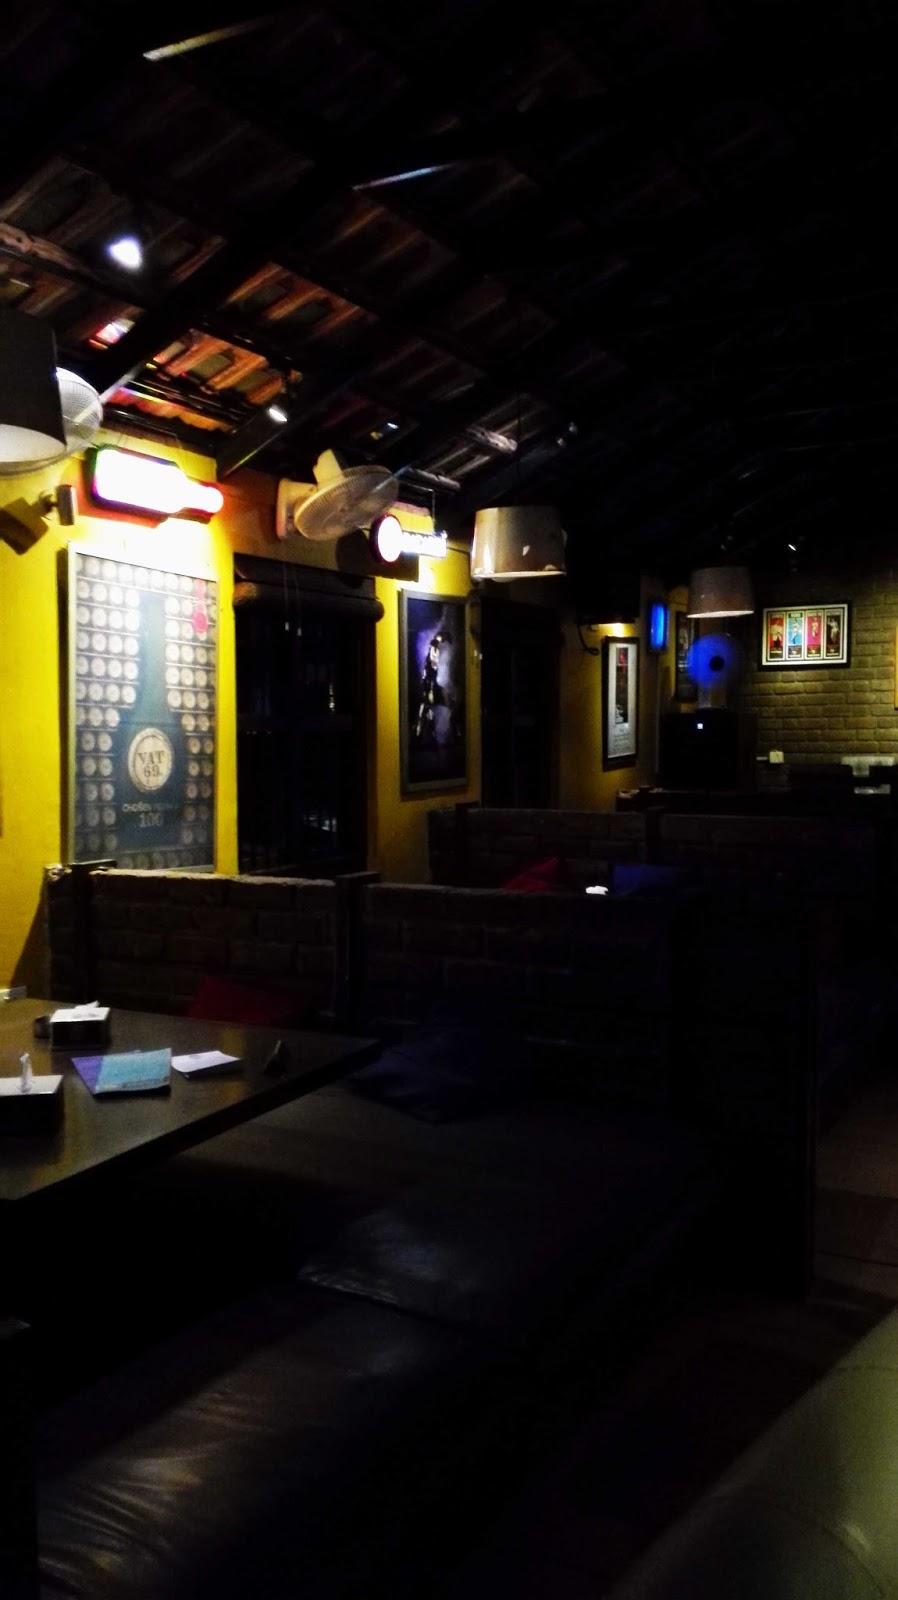 Toit pub in bangalore dating